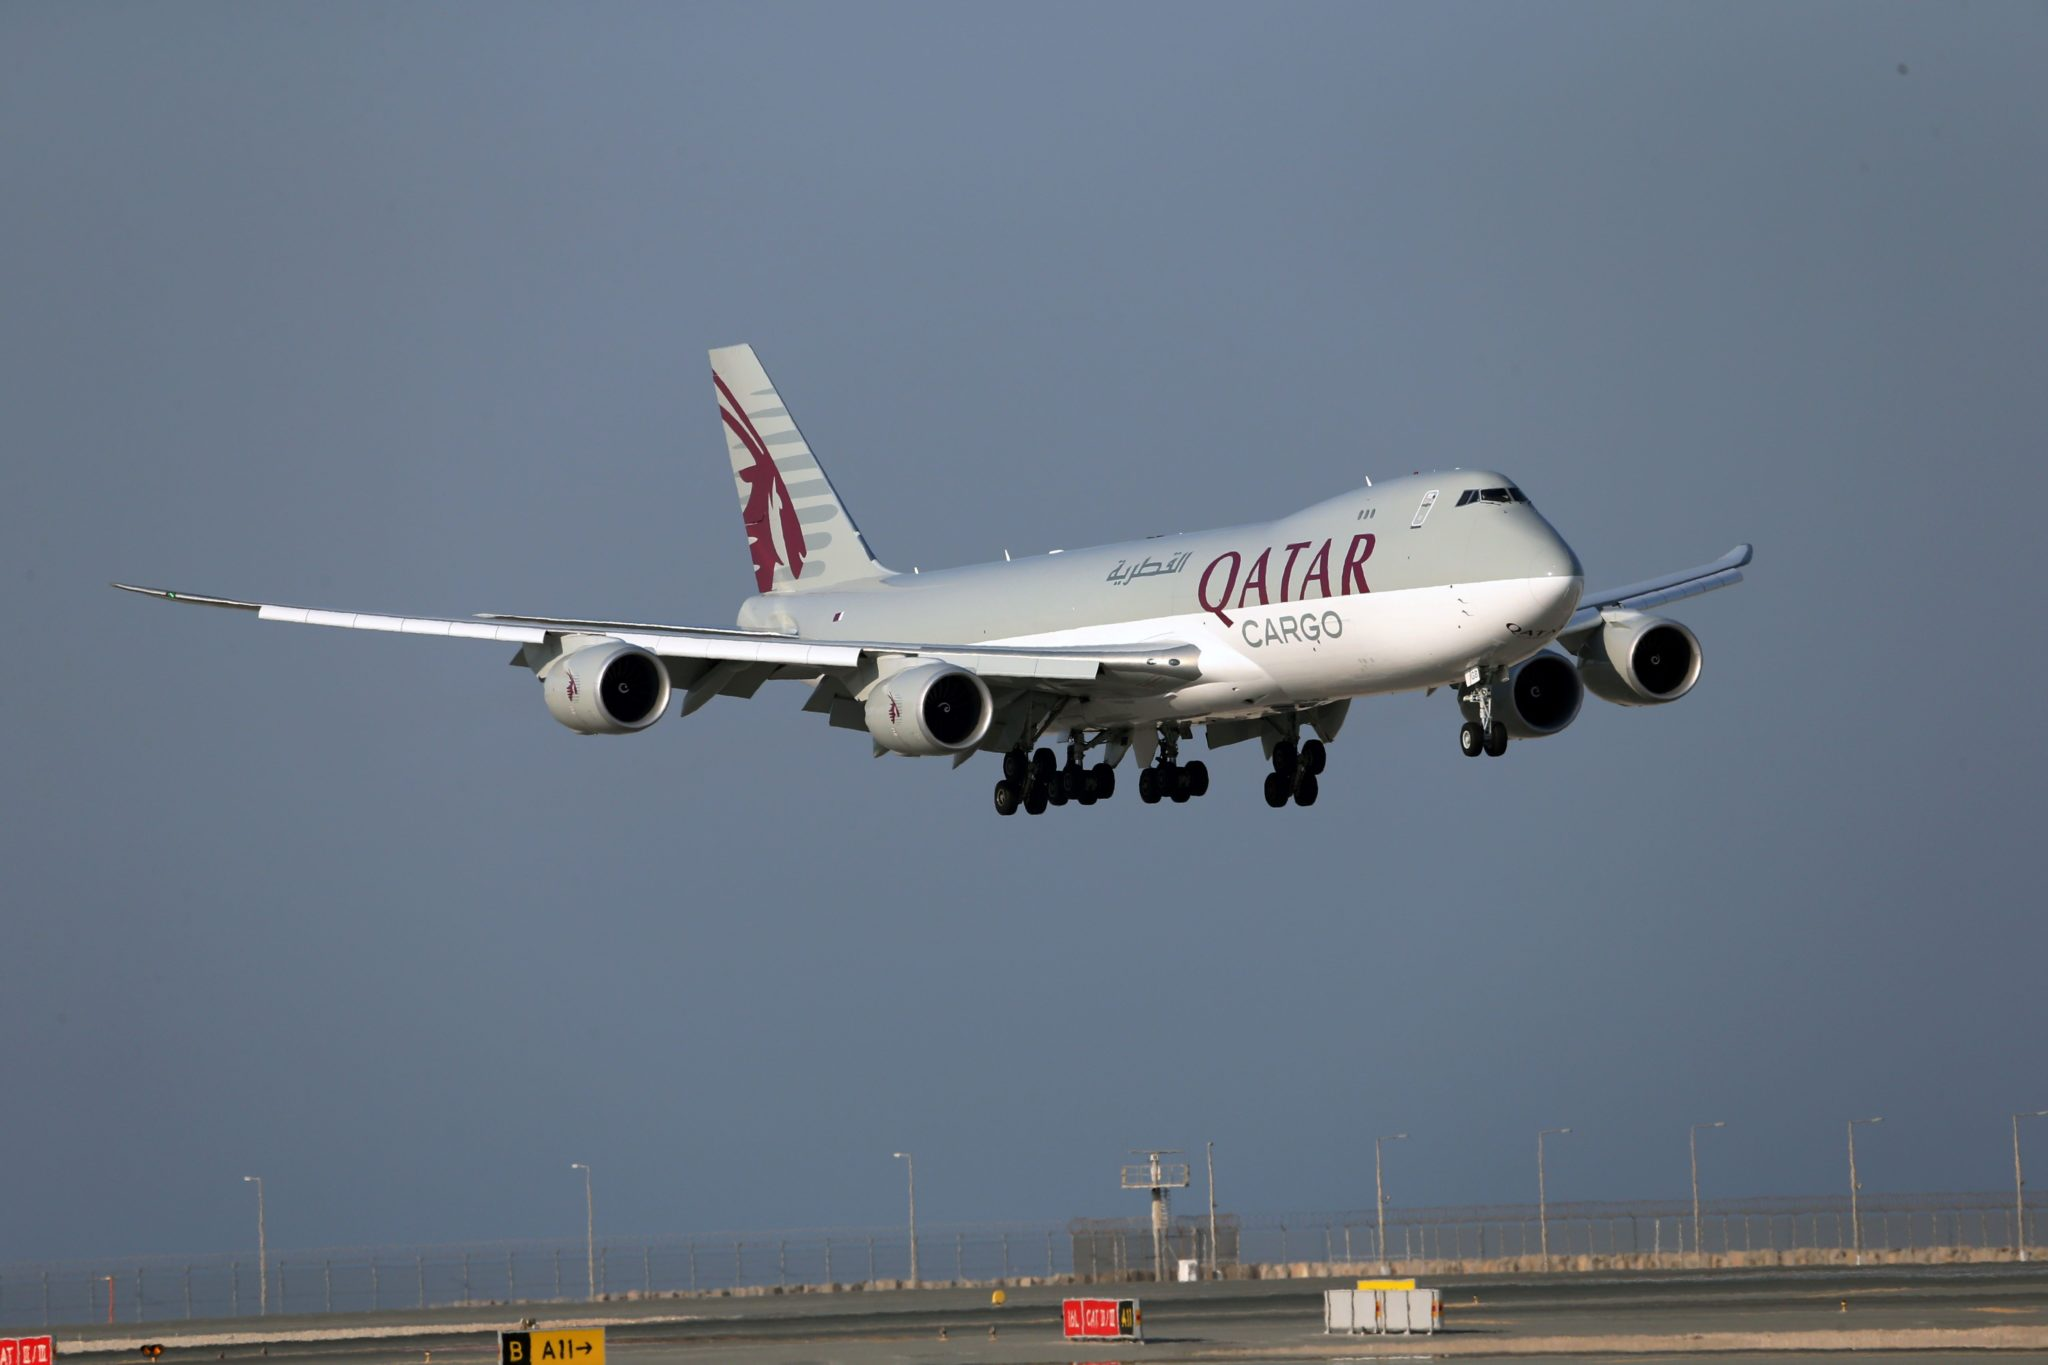 Qatar Airways Cargo appoints R-BAG Group as GSA